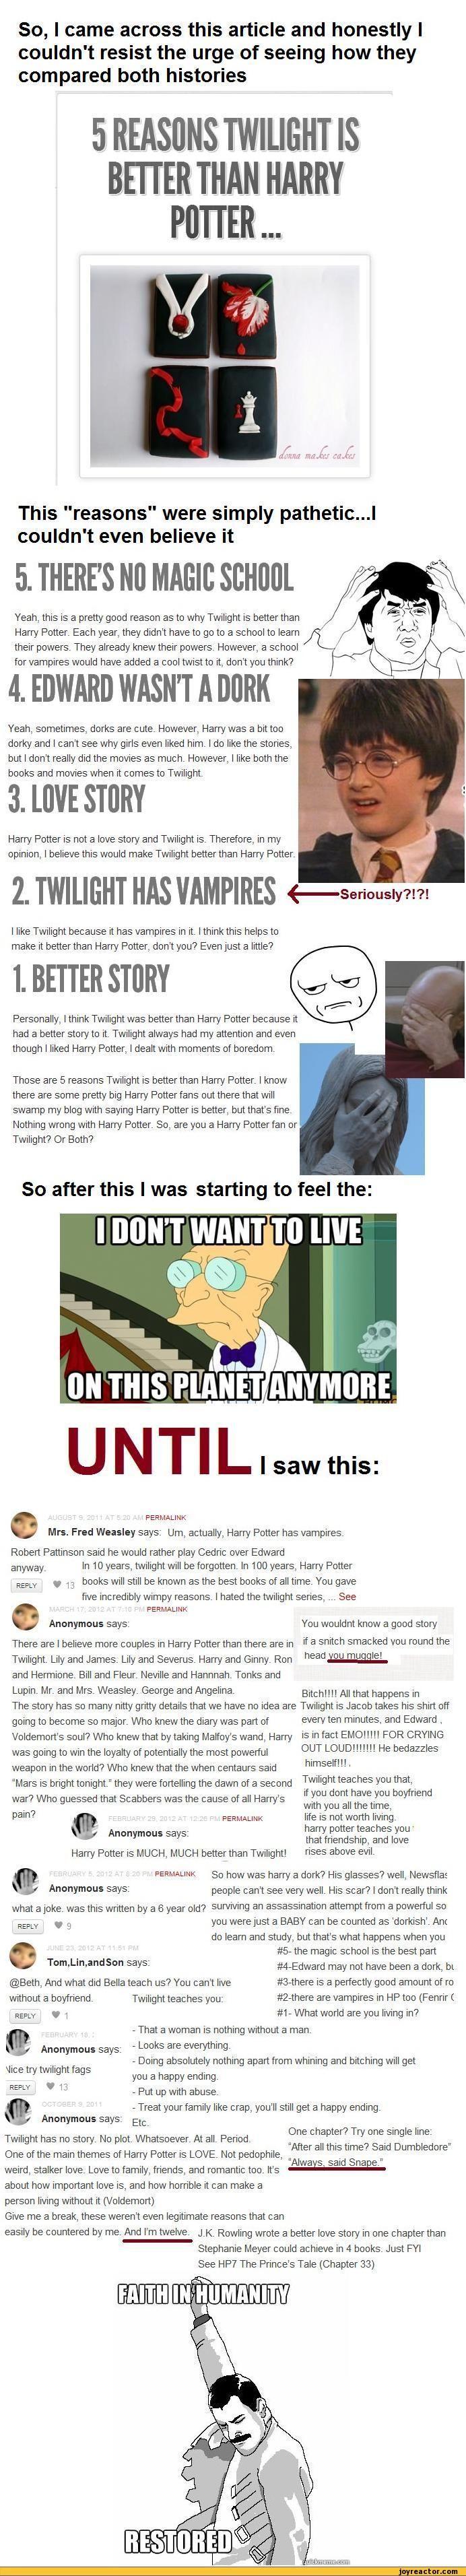 Harry Potter is better than twilight yeah I like it and all but I'm a potterhead u muggles